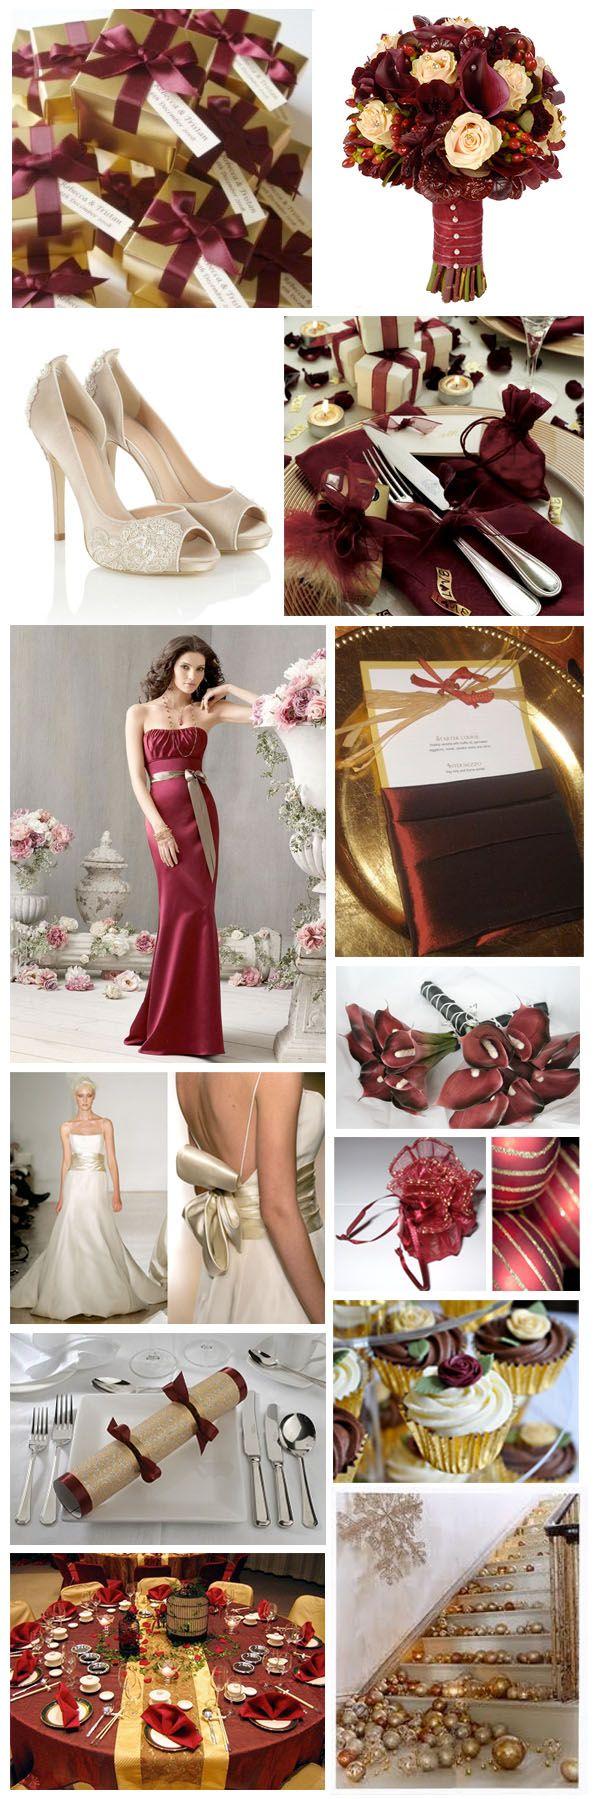 Burgandy And Gold Wedding Theme